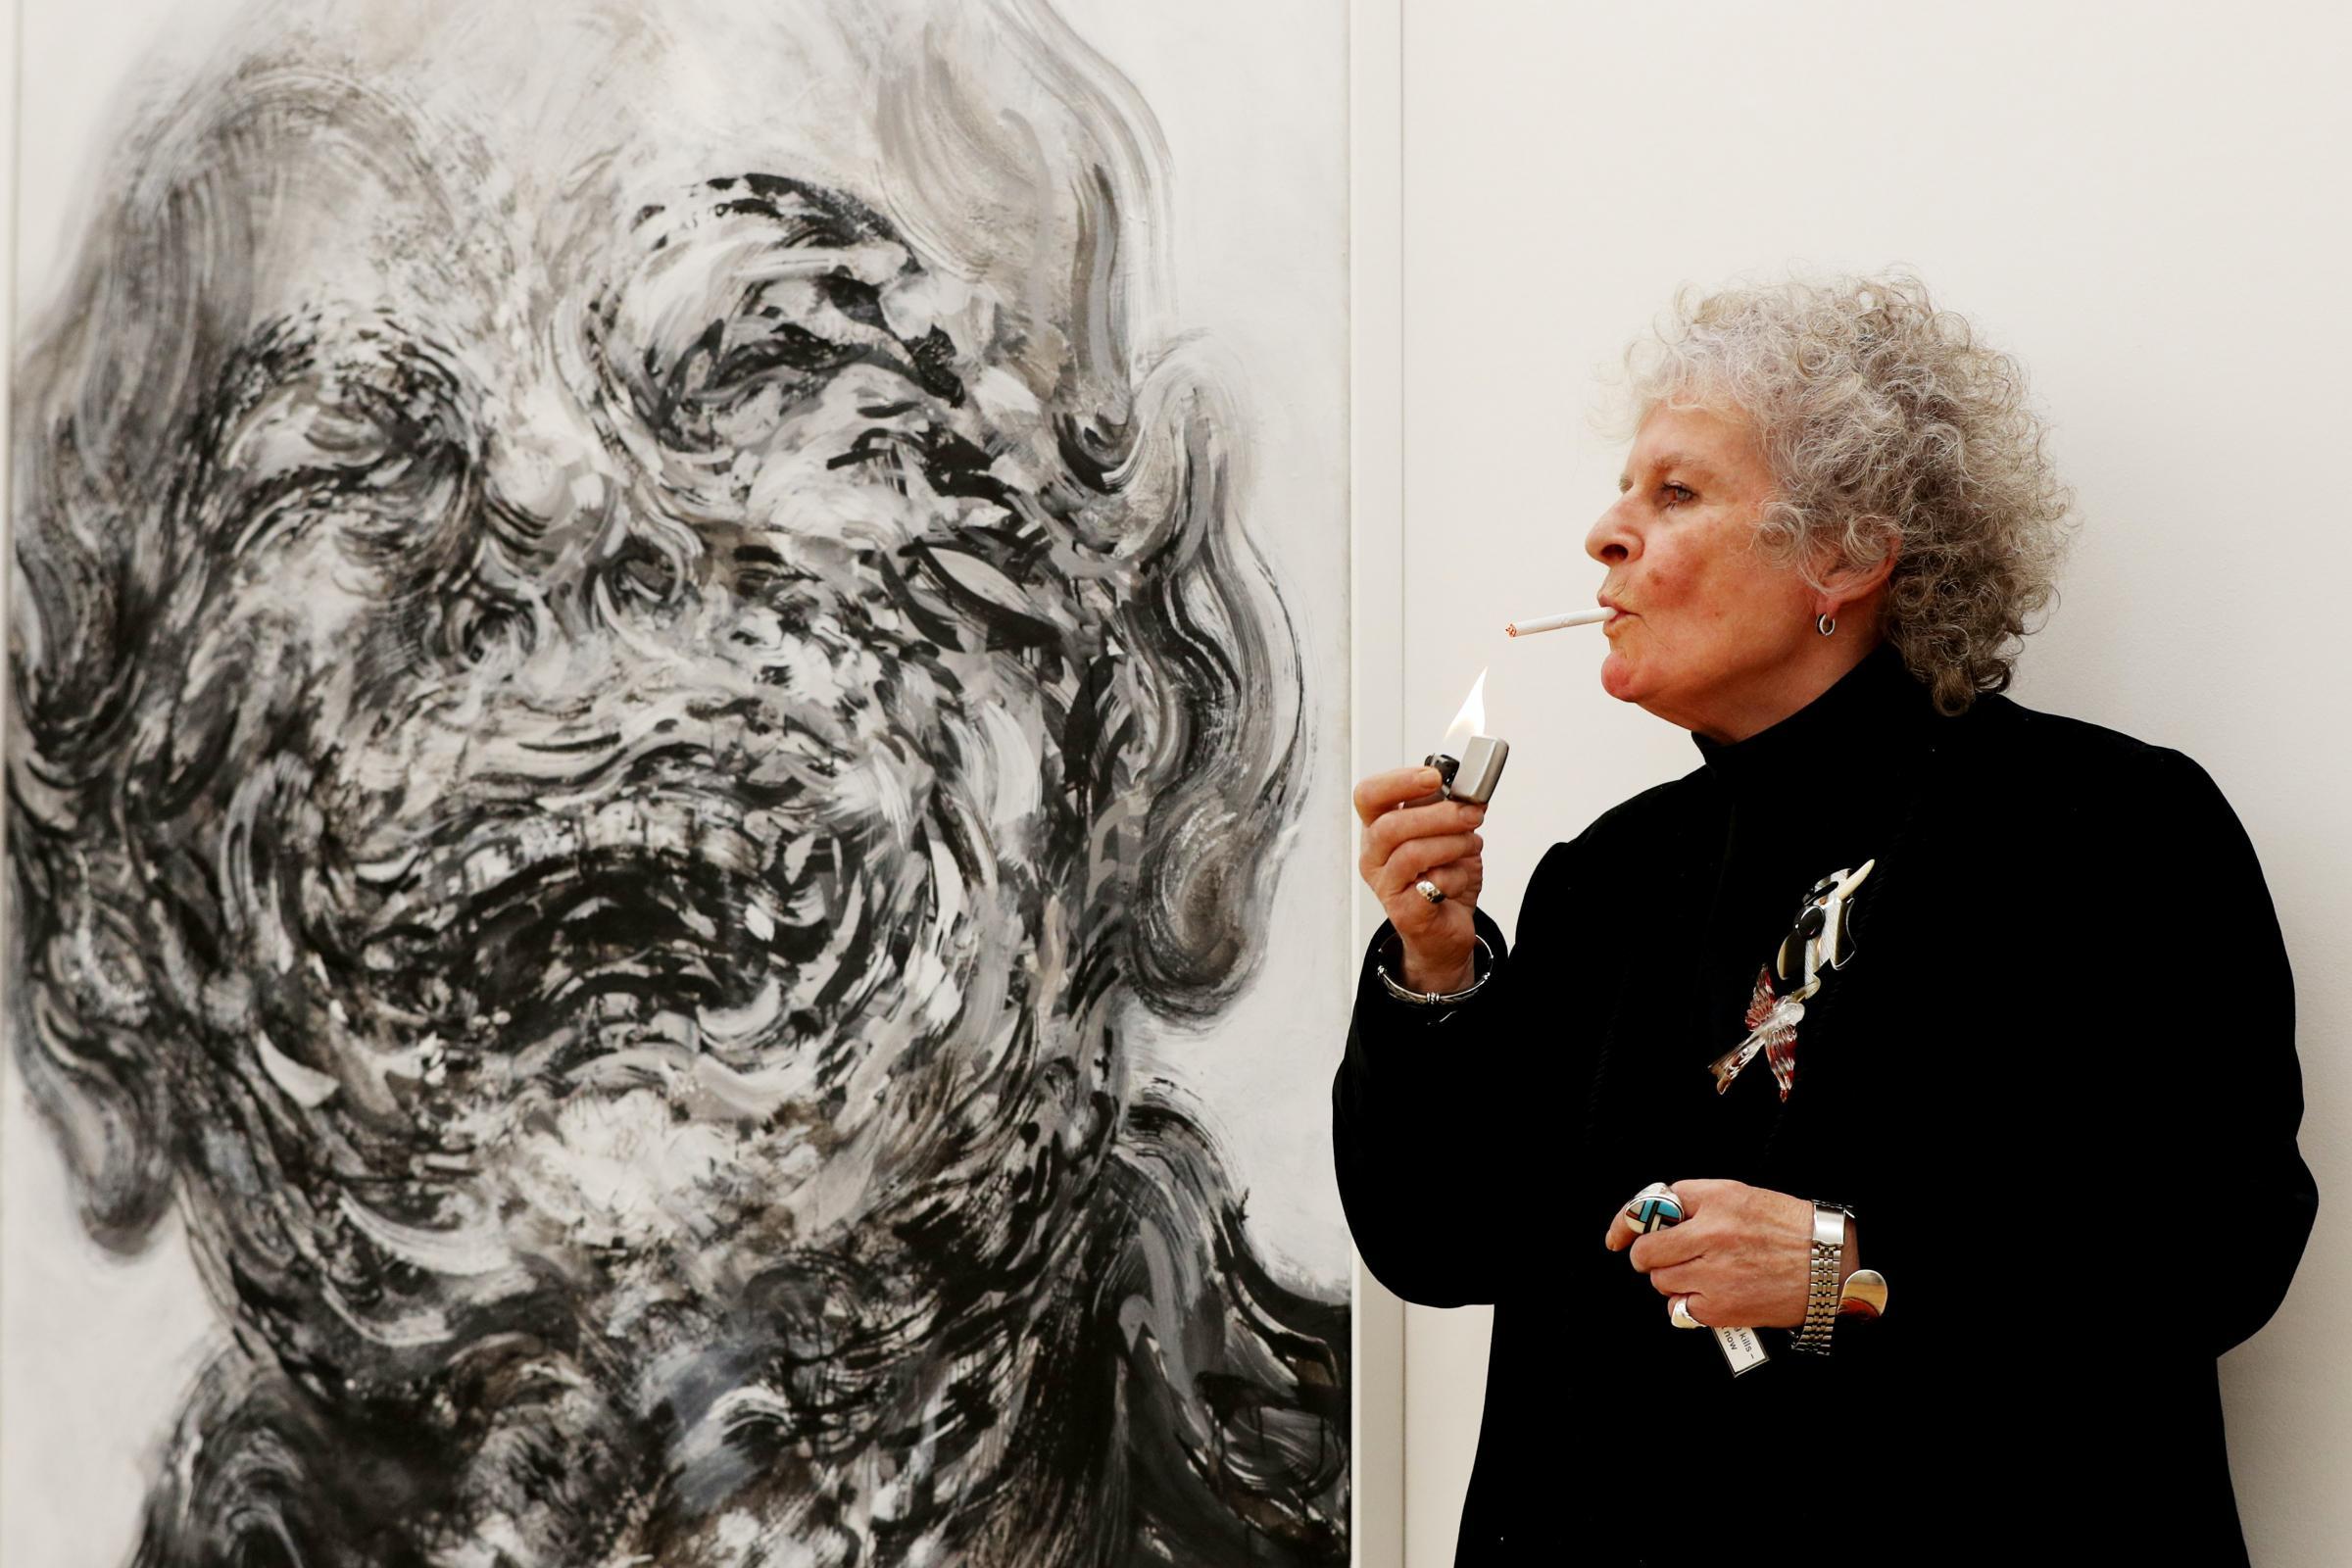 Painter Maggi Hambling opens exhibition of lockdown works | Bucks Free Press